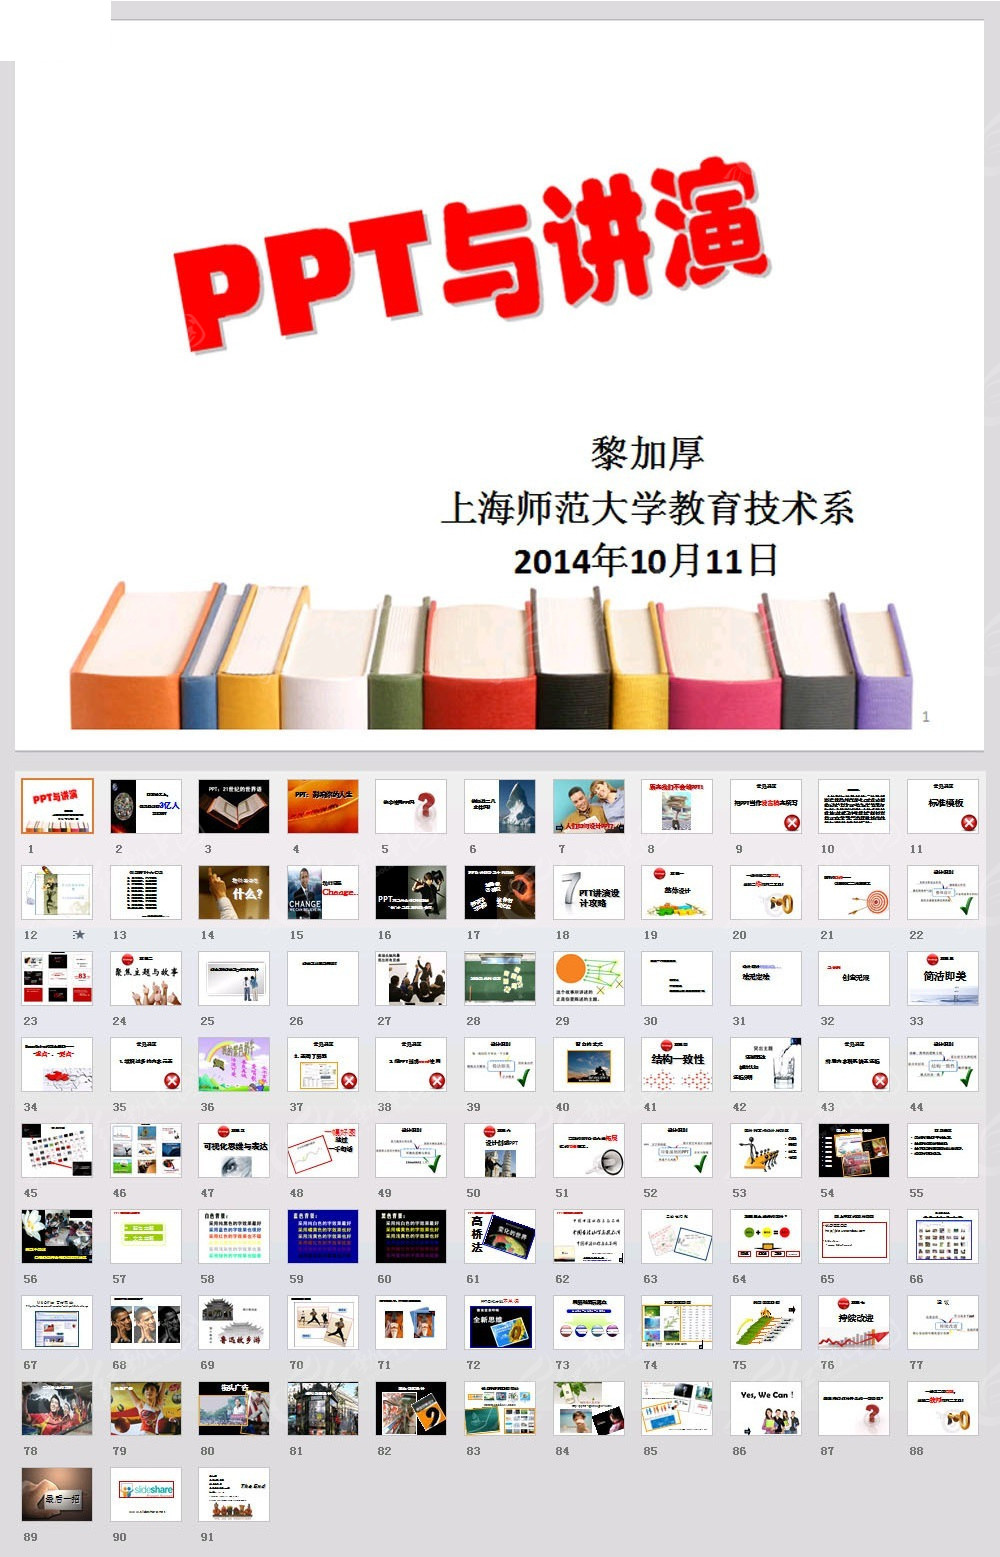 ppt与演讲模板免费下载_教育培训素材图片